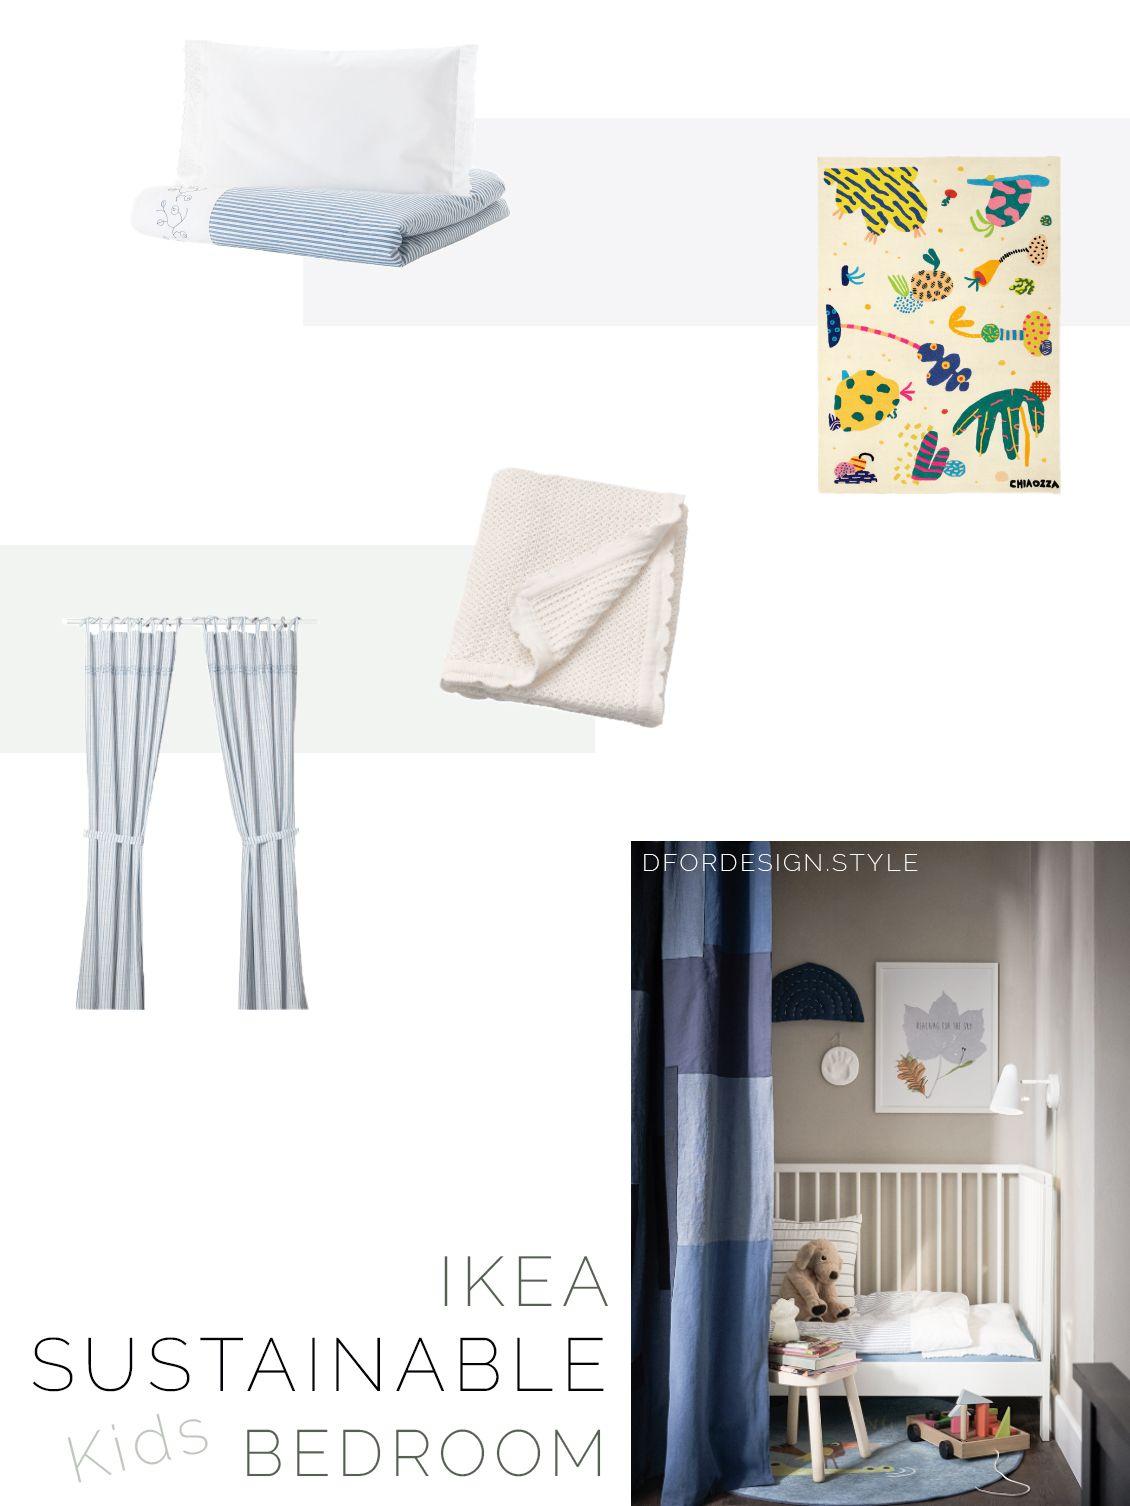 Biophilic & Sustainable Interior Design · IKEA 2020 ...